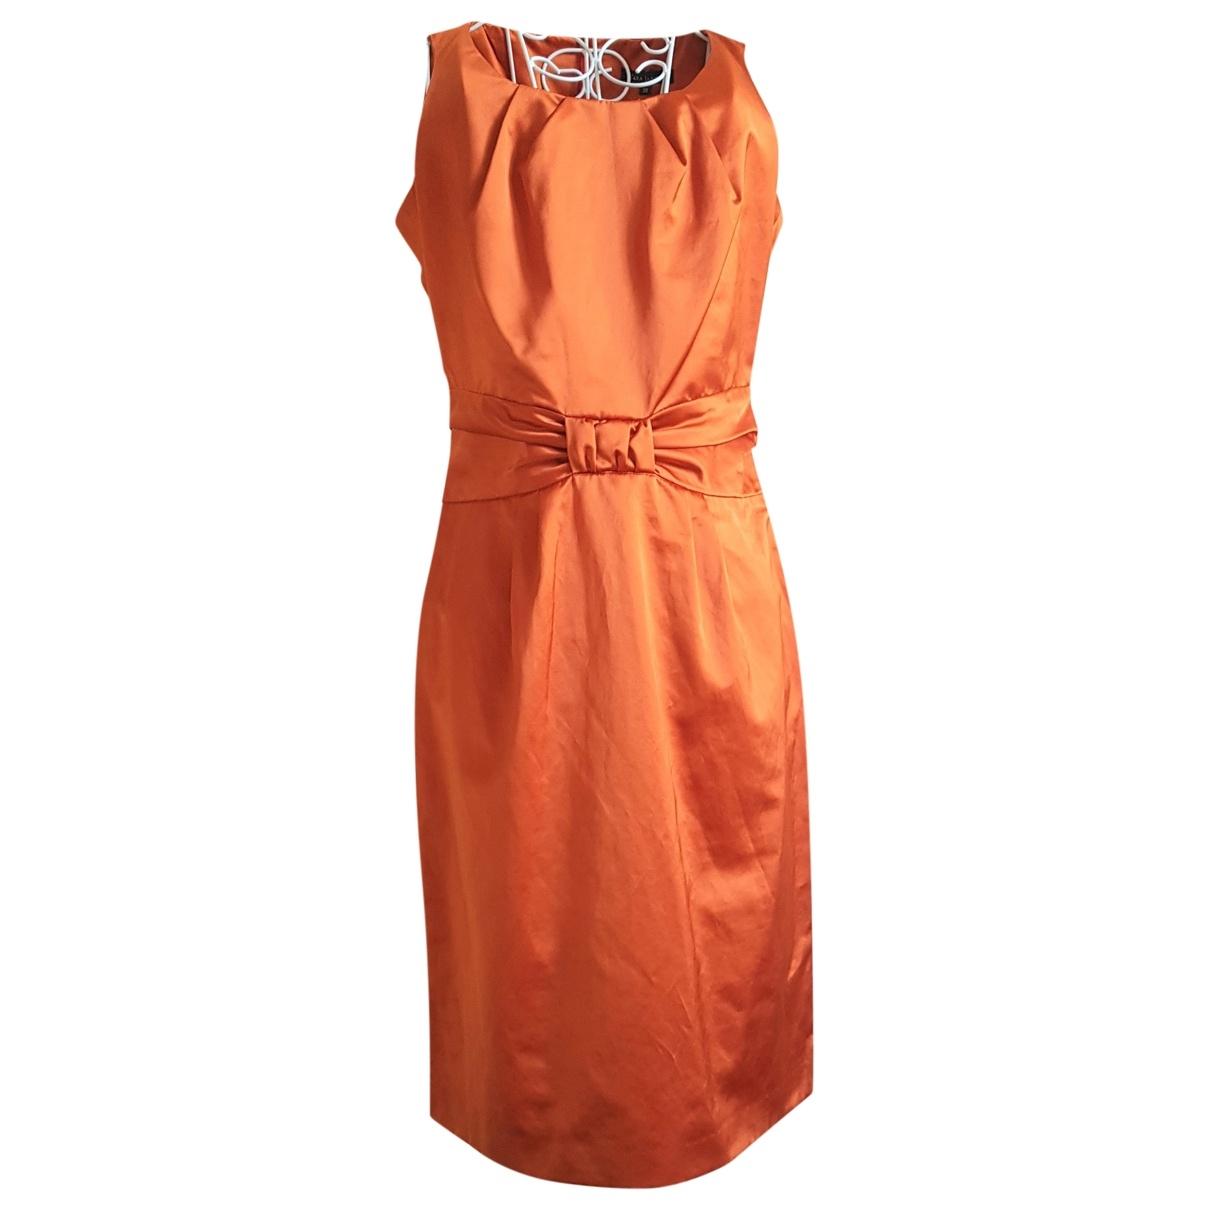 Tara Jarmon \N Orange Cotton dress for Women 38 IT